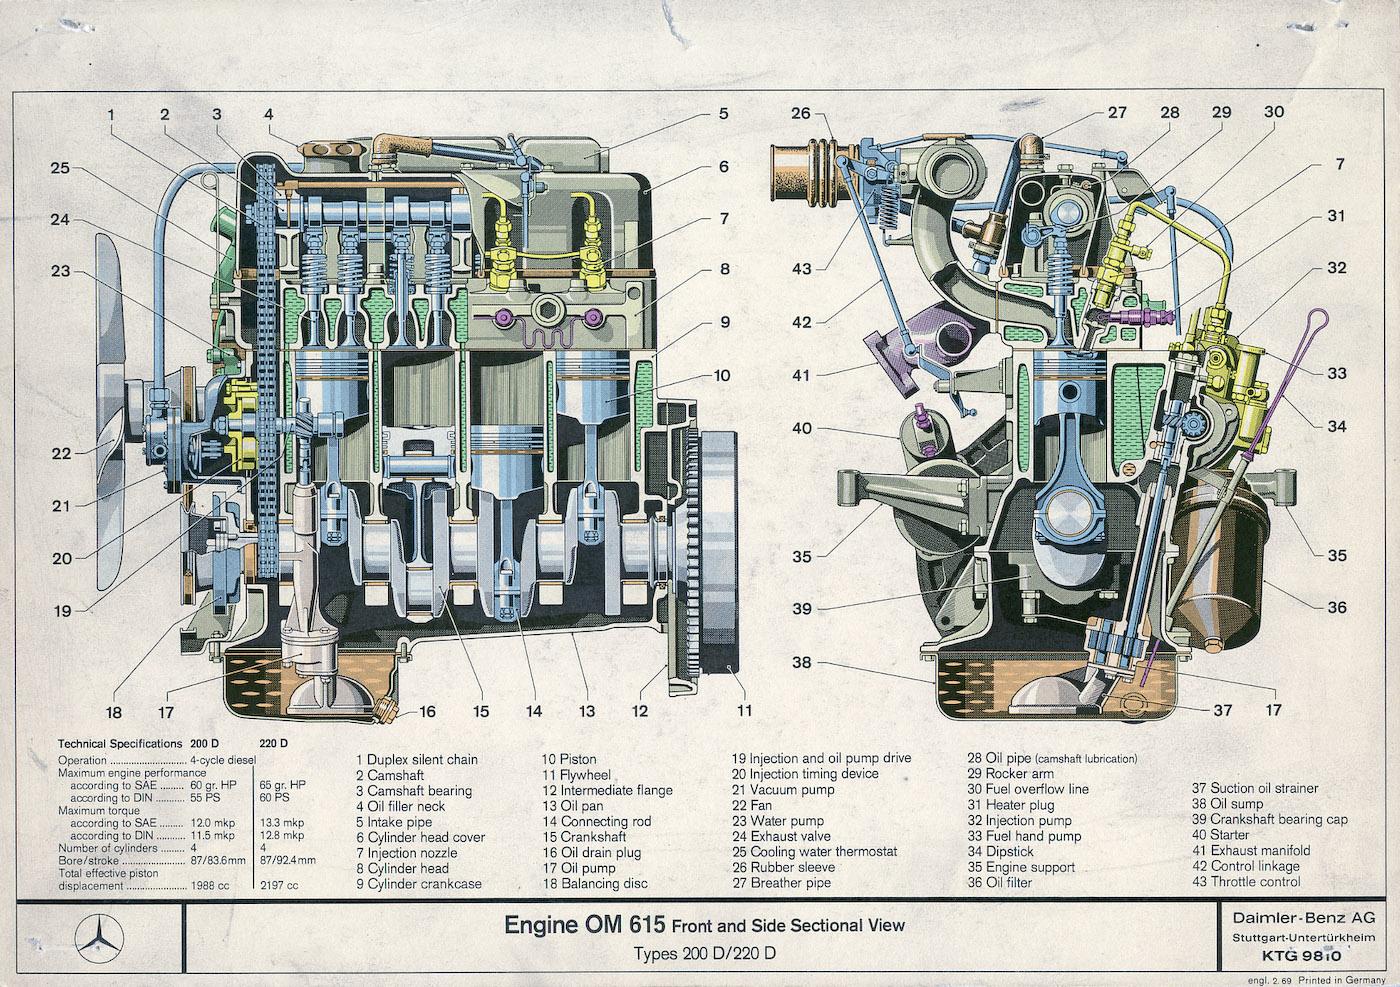 1975 240d oil filter circulation problem